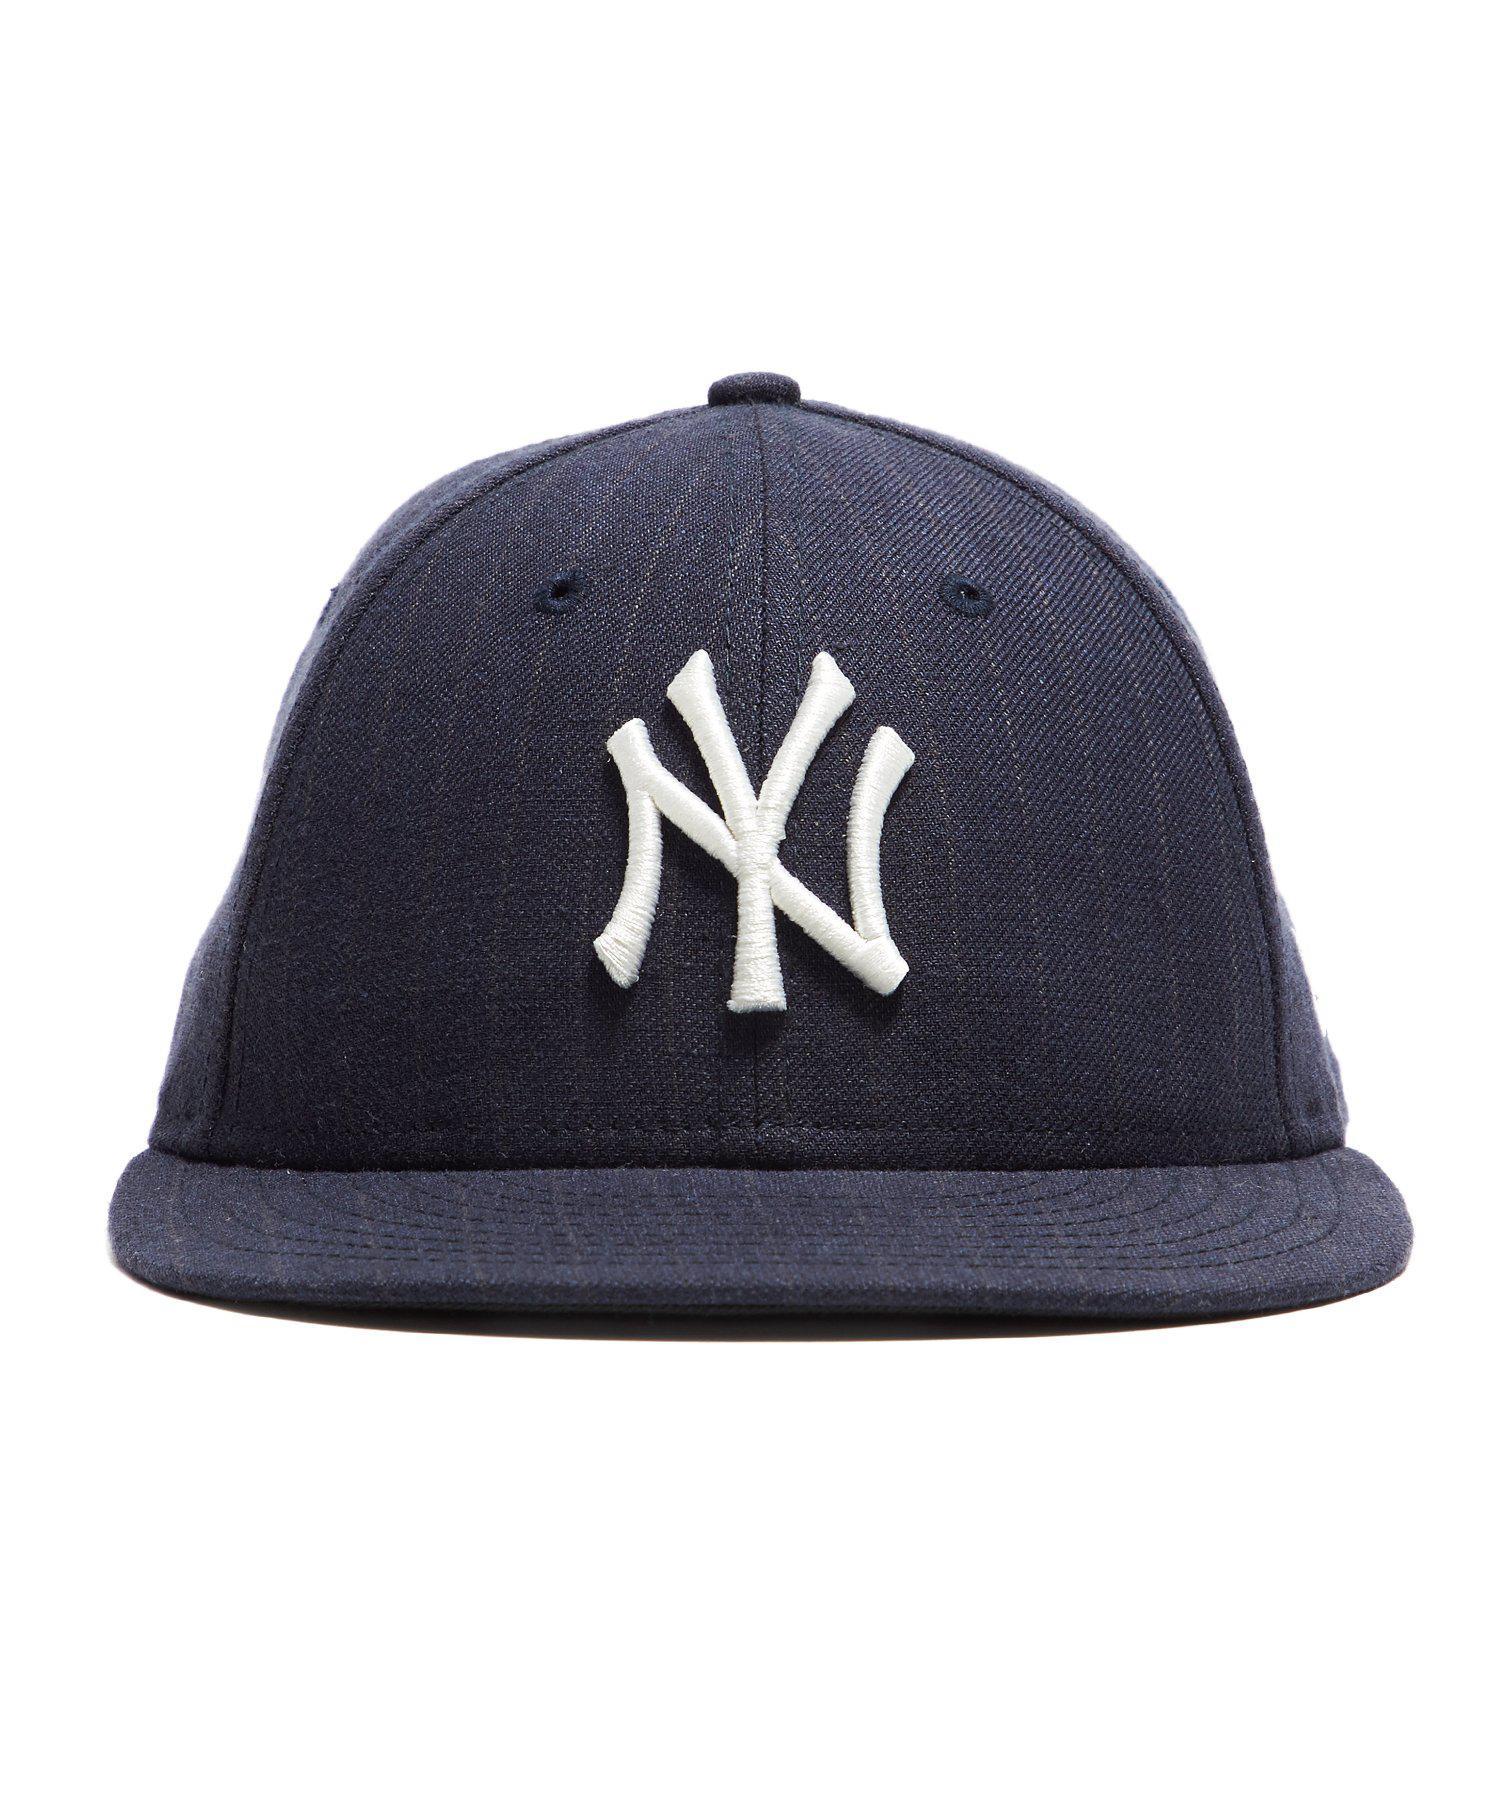 206c9acd874 Lyst - NEW ERA HATS New York Yankees Cap In Navy Pinstripe in Blue ...